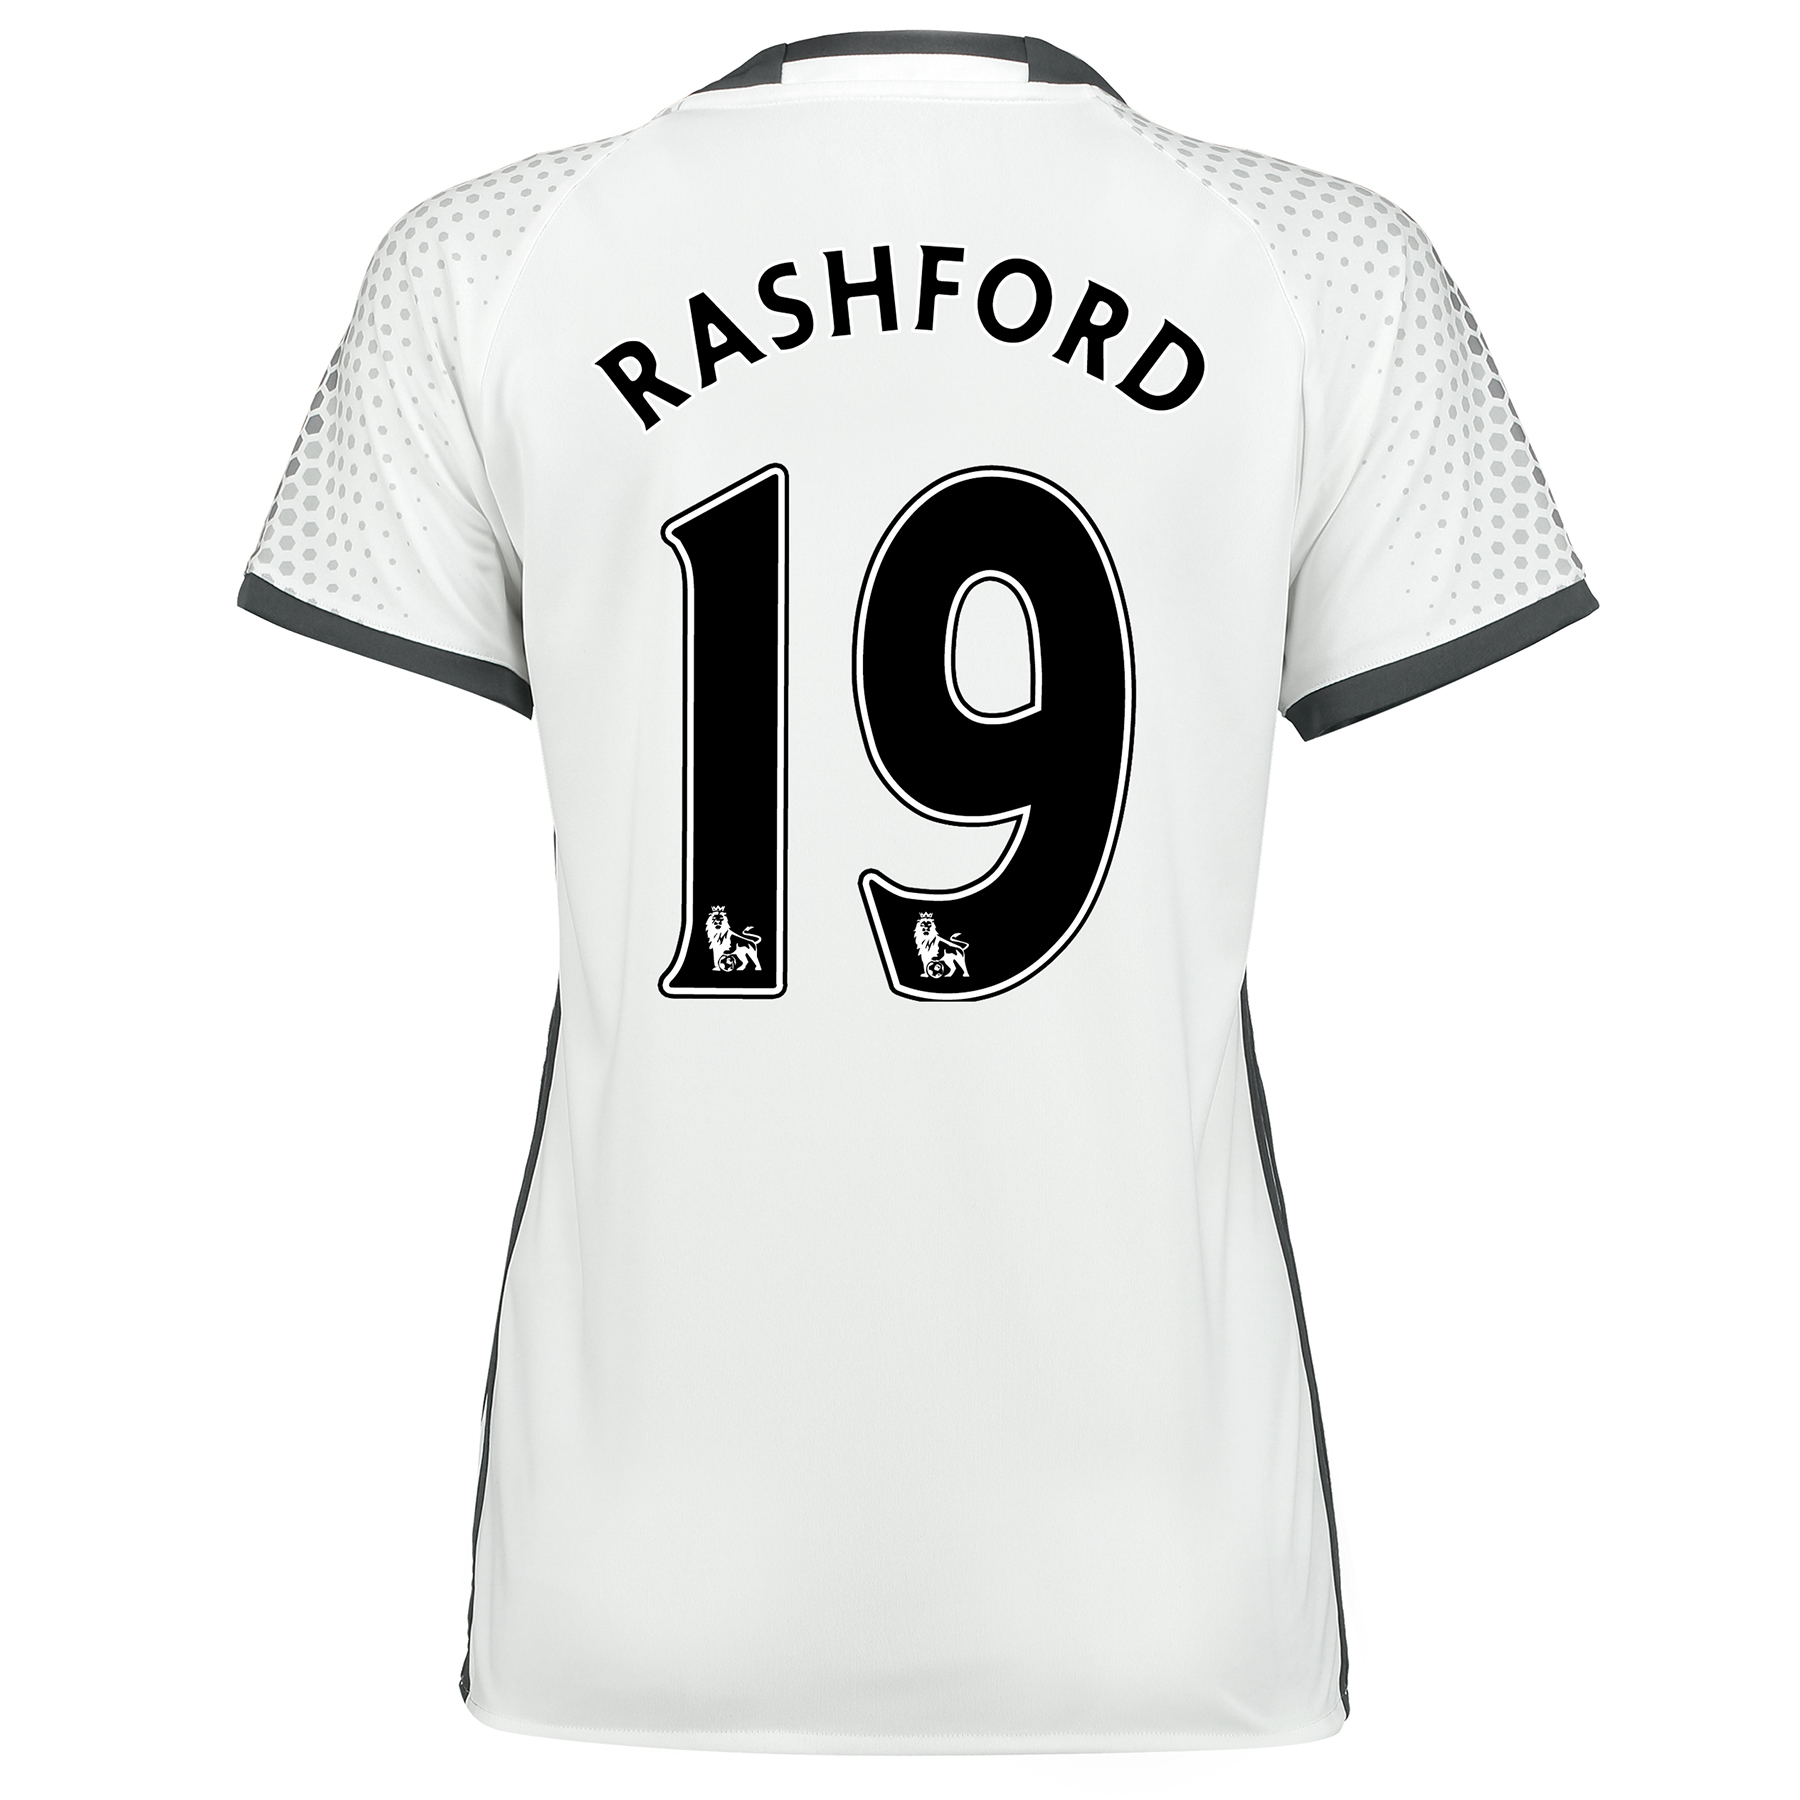 Manchester United Third Shirt 2016-17 - Womens with Rashford 19 printi